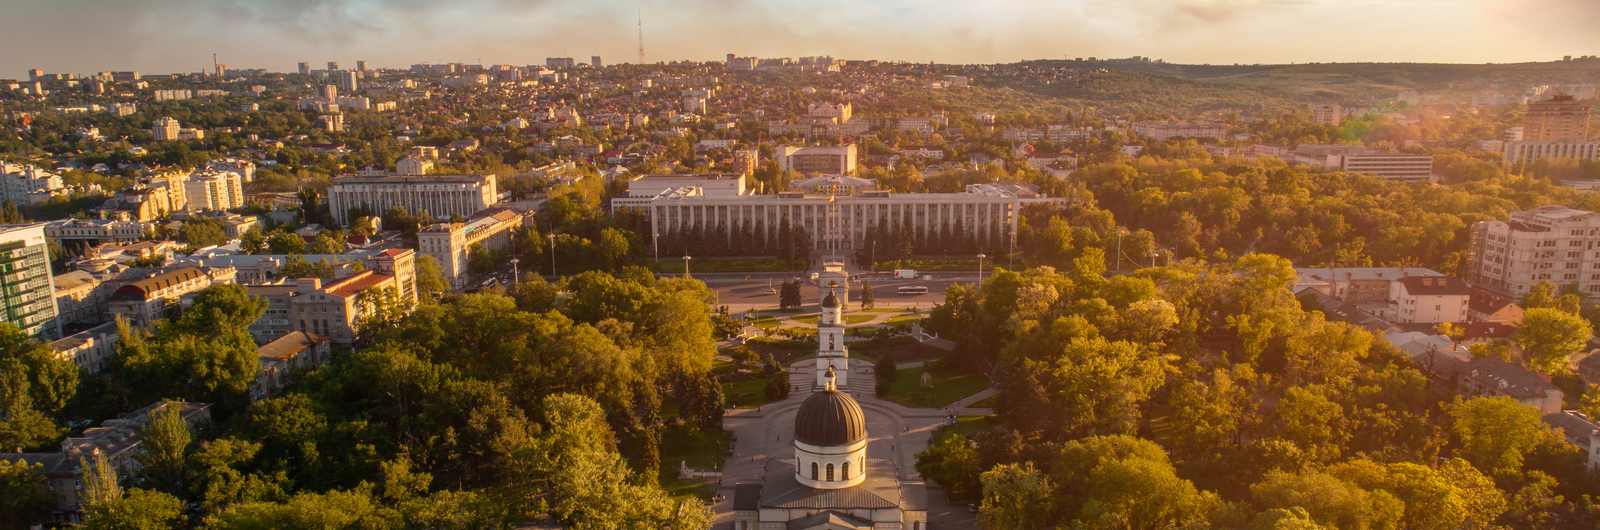 chisinau city header